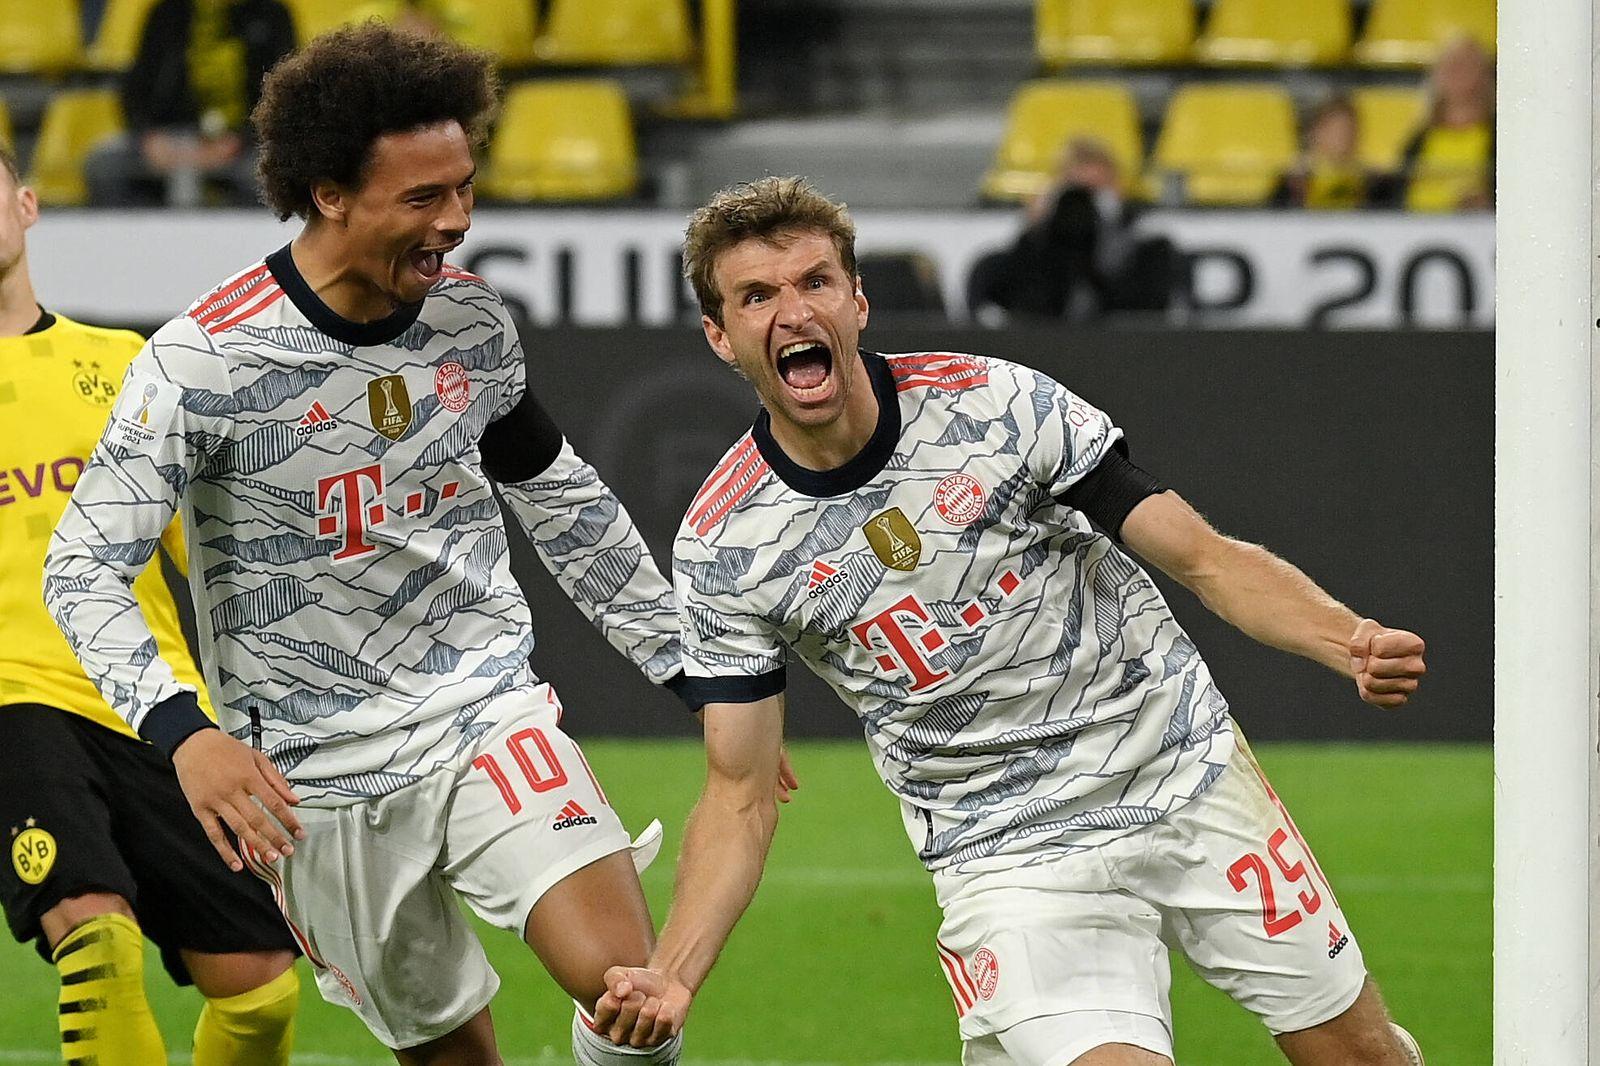 Dortmund, Signal Iduna Park, 17.08.21, GER, Herren, Supercup, Saison 2021-2022, Borussia Dortmund - FC Bayern Muenchen